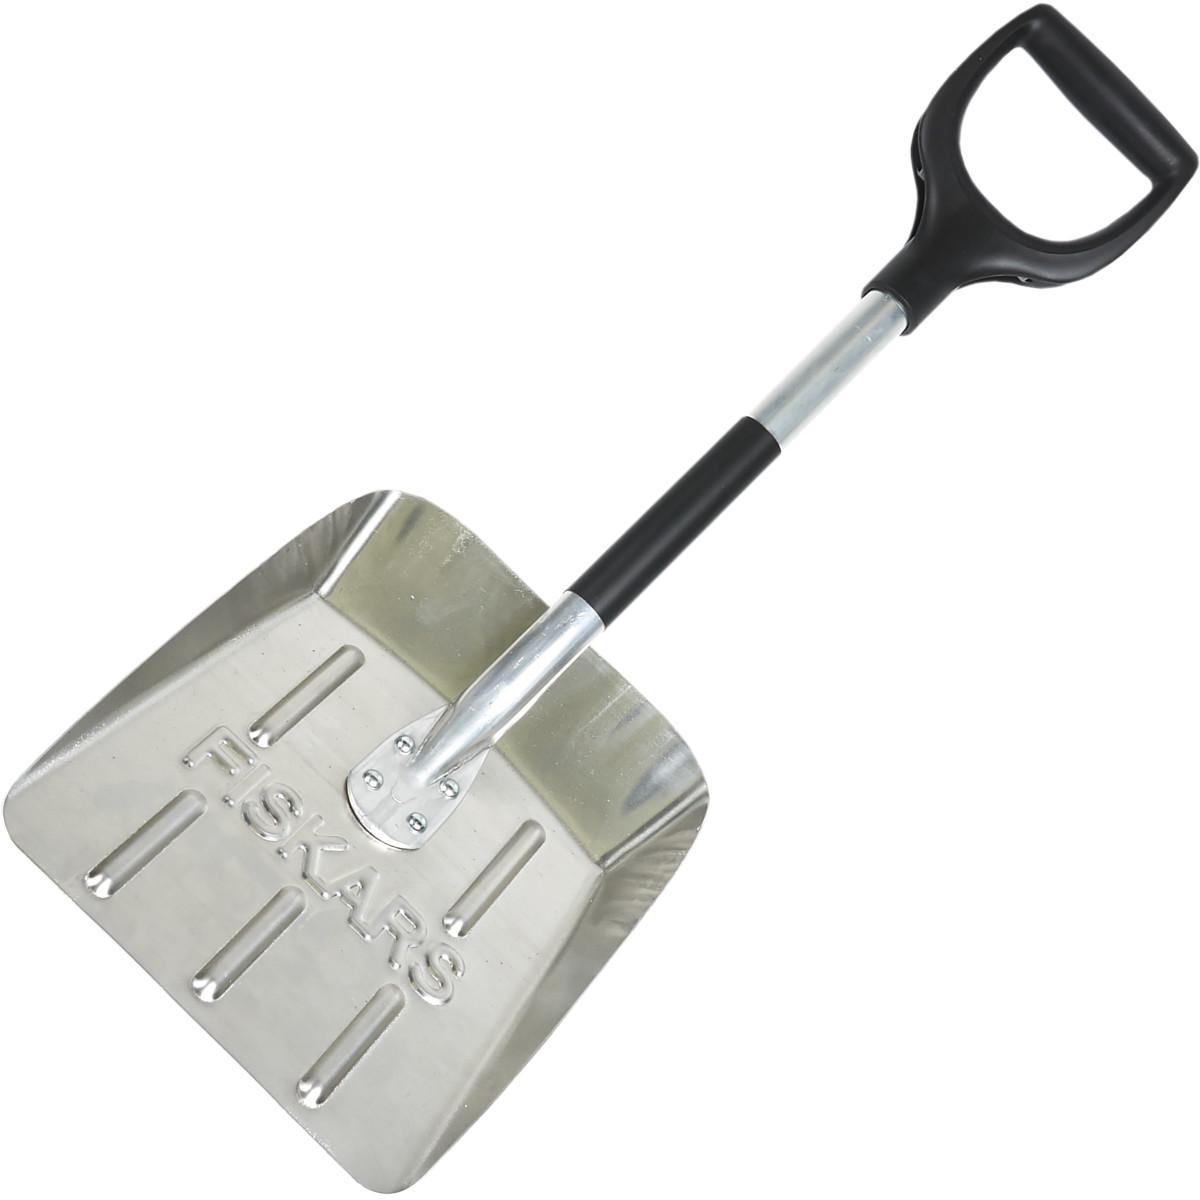 Лопата автомобильная для уборки снега FISKARS алюминий